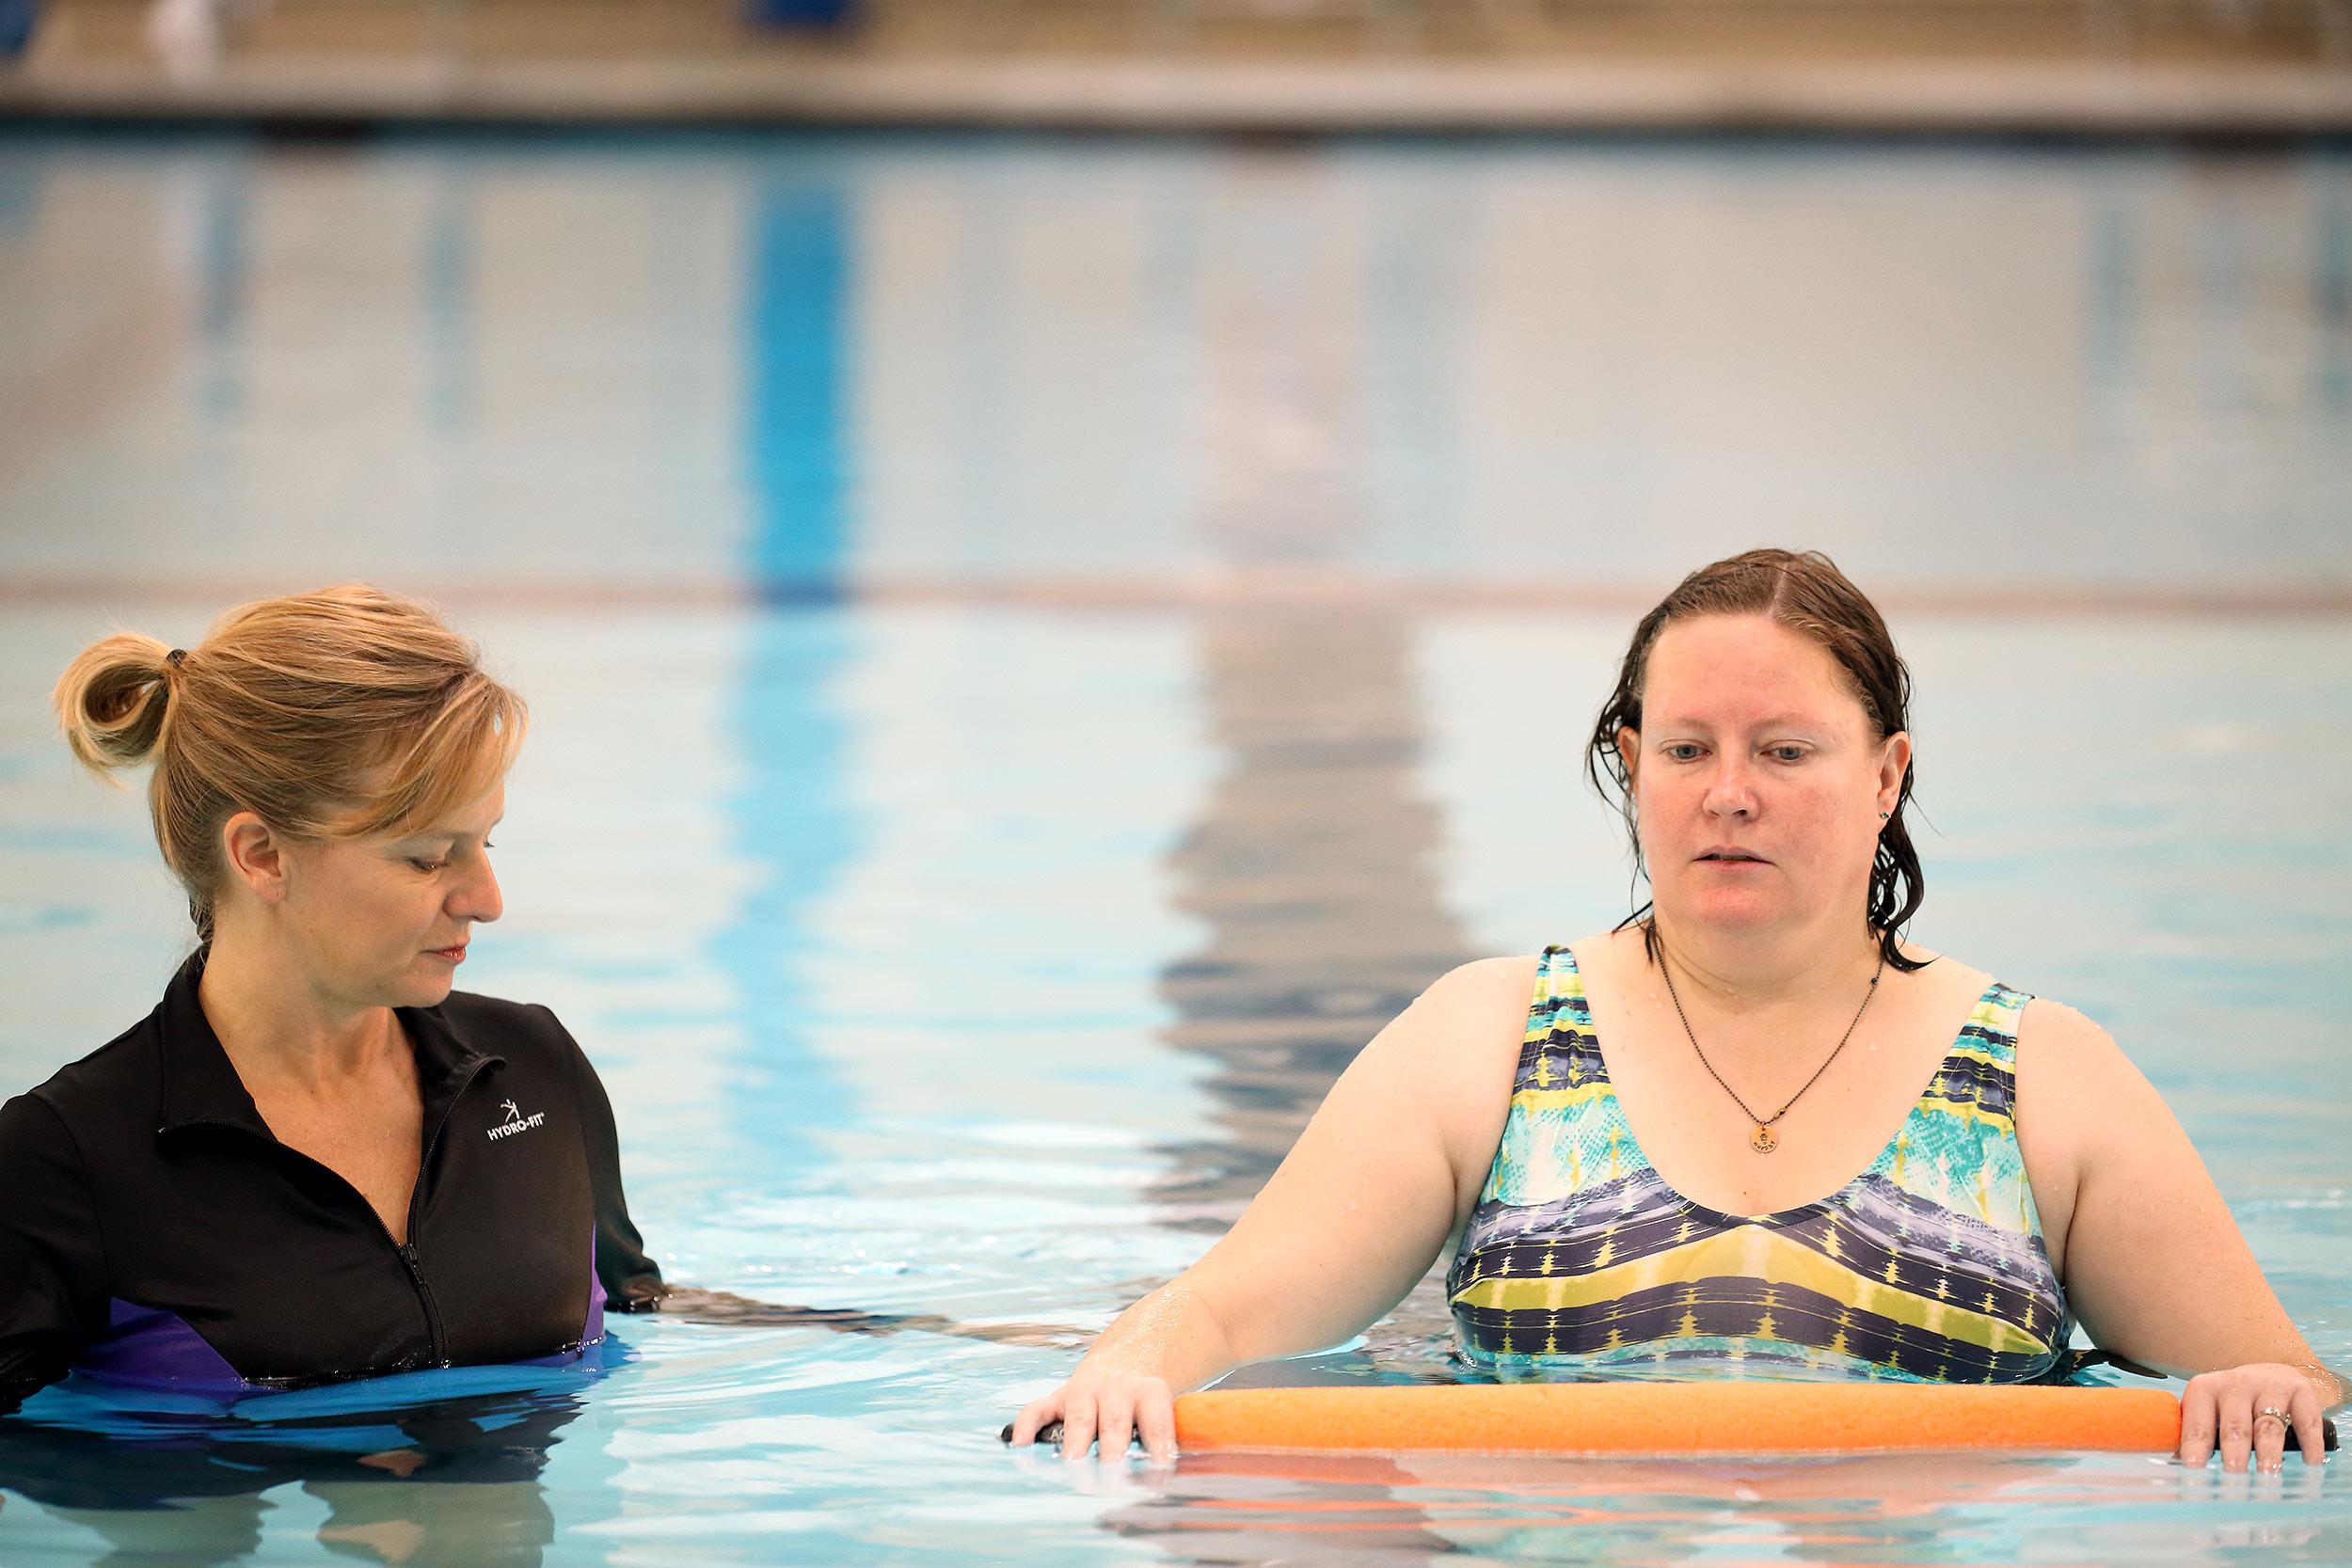 nancy-with-patient-in-pool2.jpg